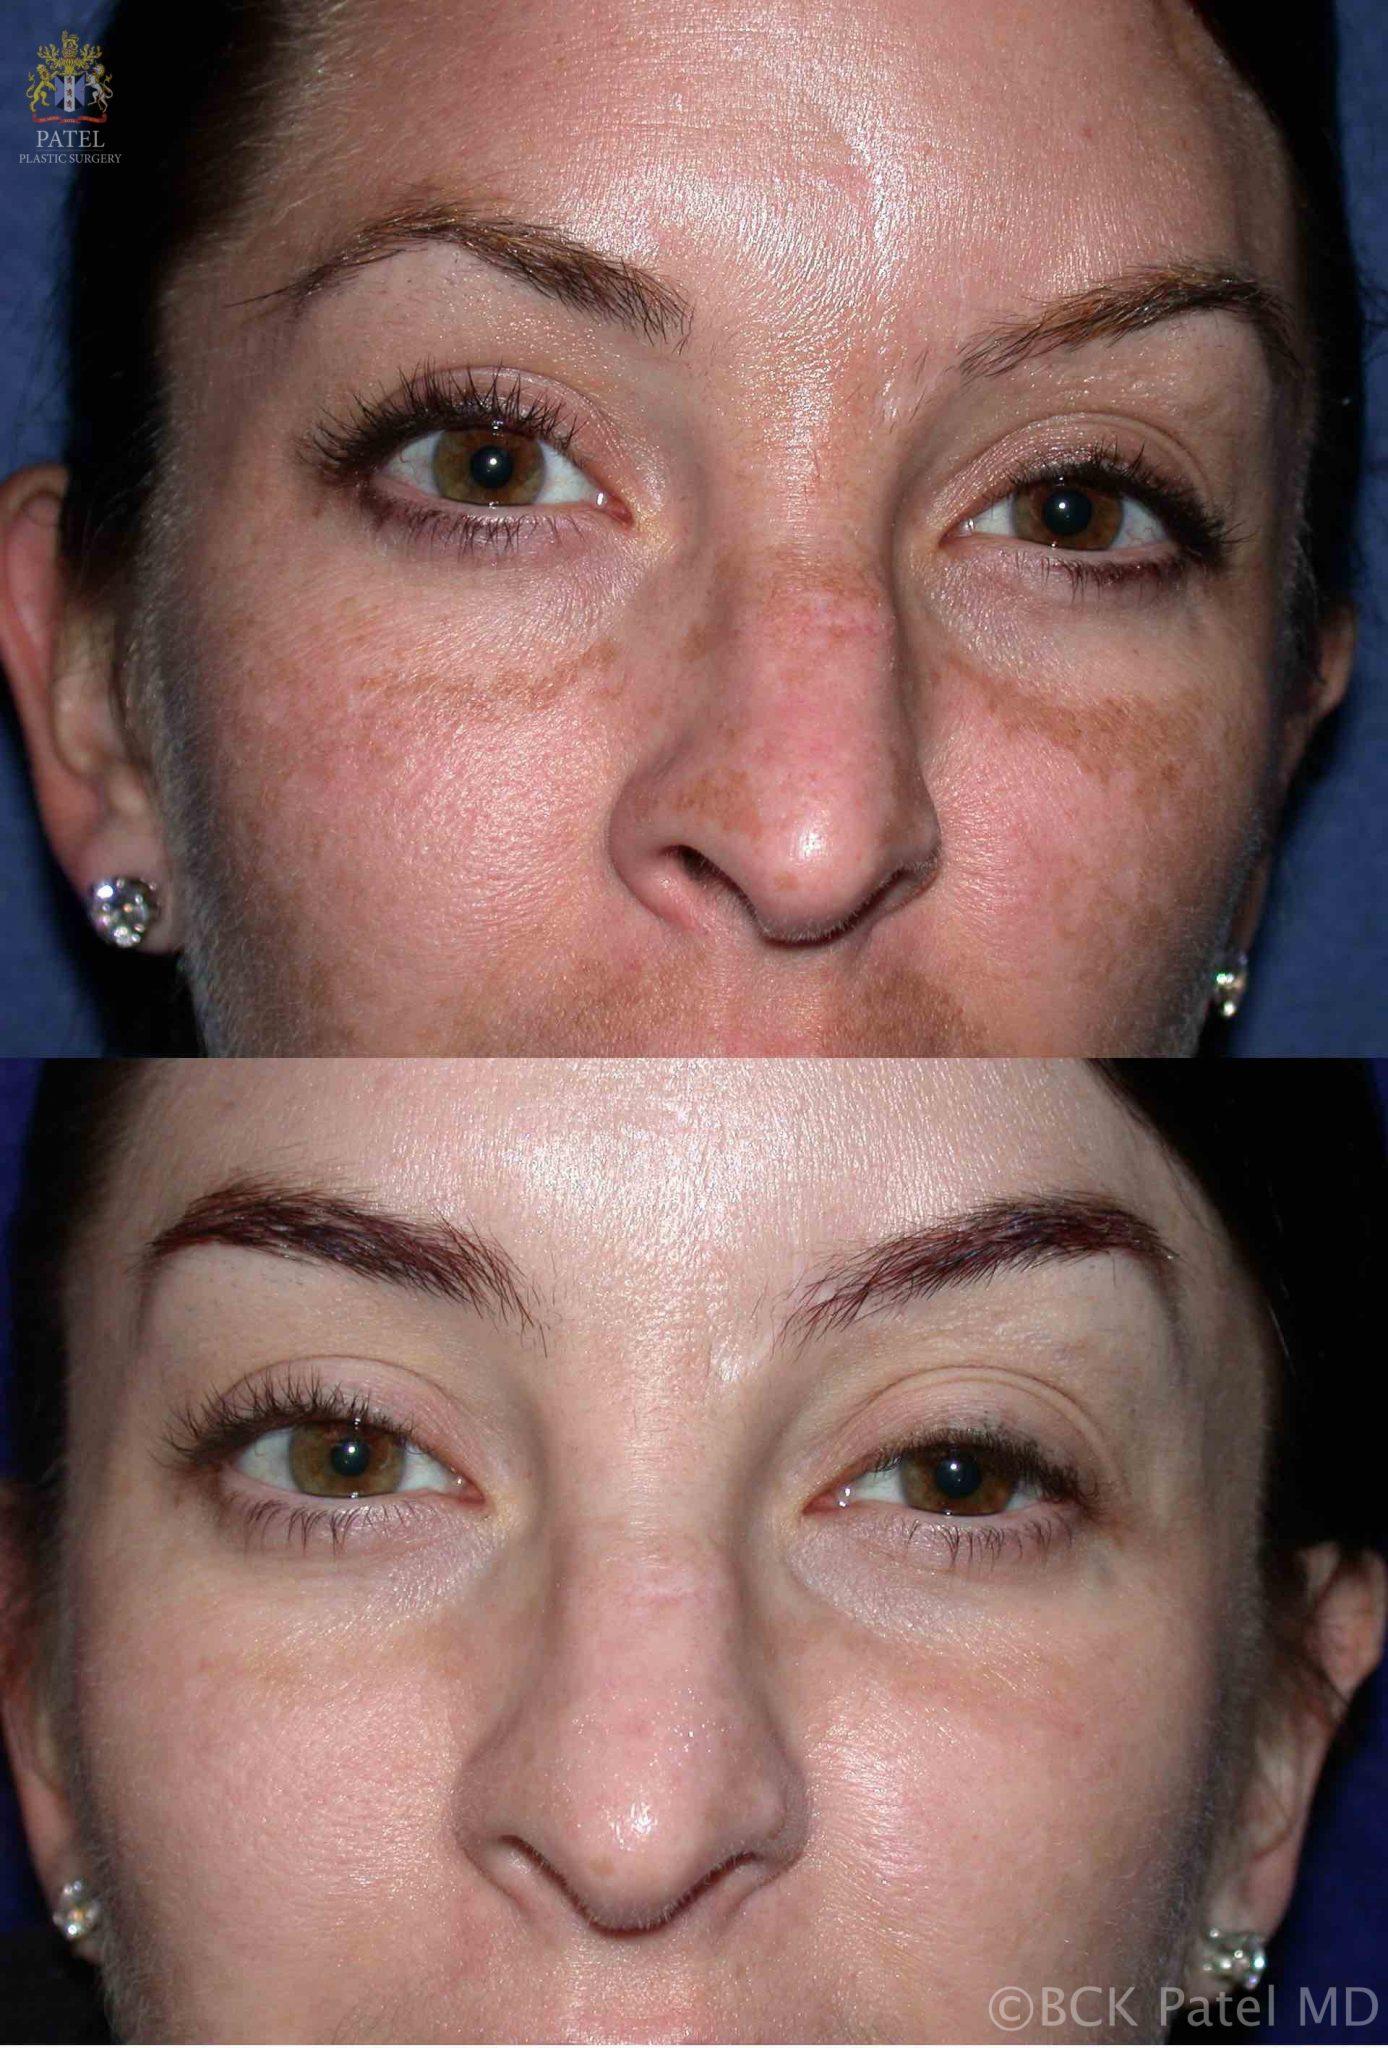 englishsurgeon.com. Chemical peel treatment results for melasma by Dr. BCK Patel MD, FRCS, Salt Lake City, St George, London